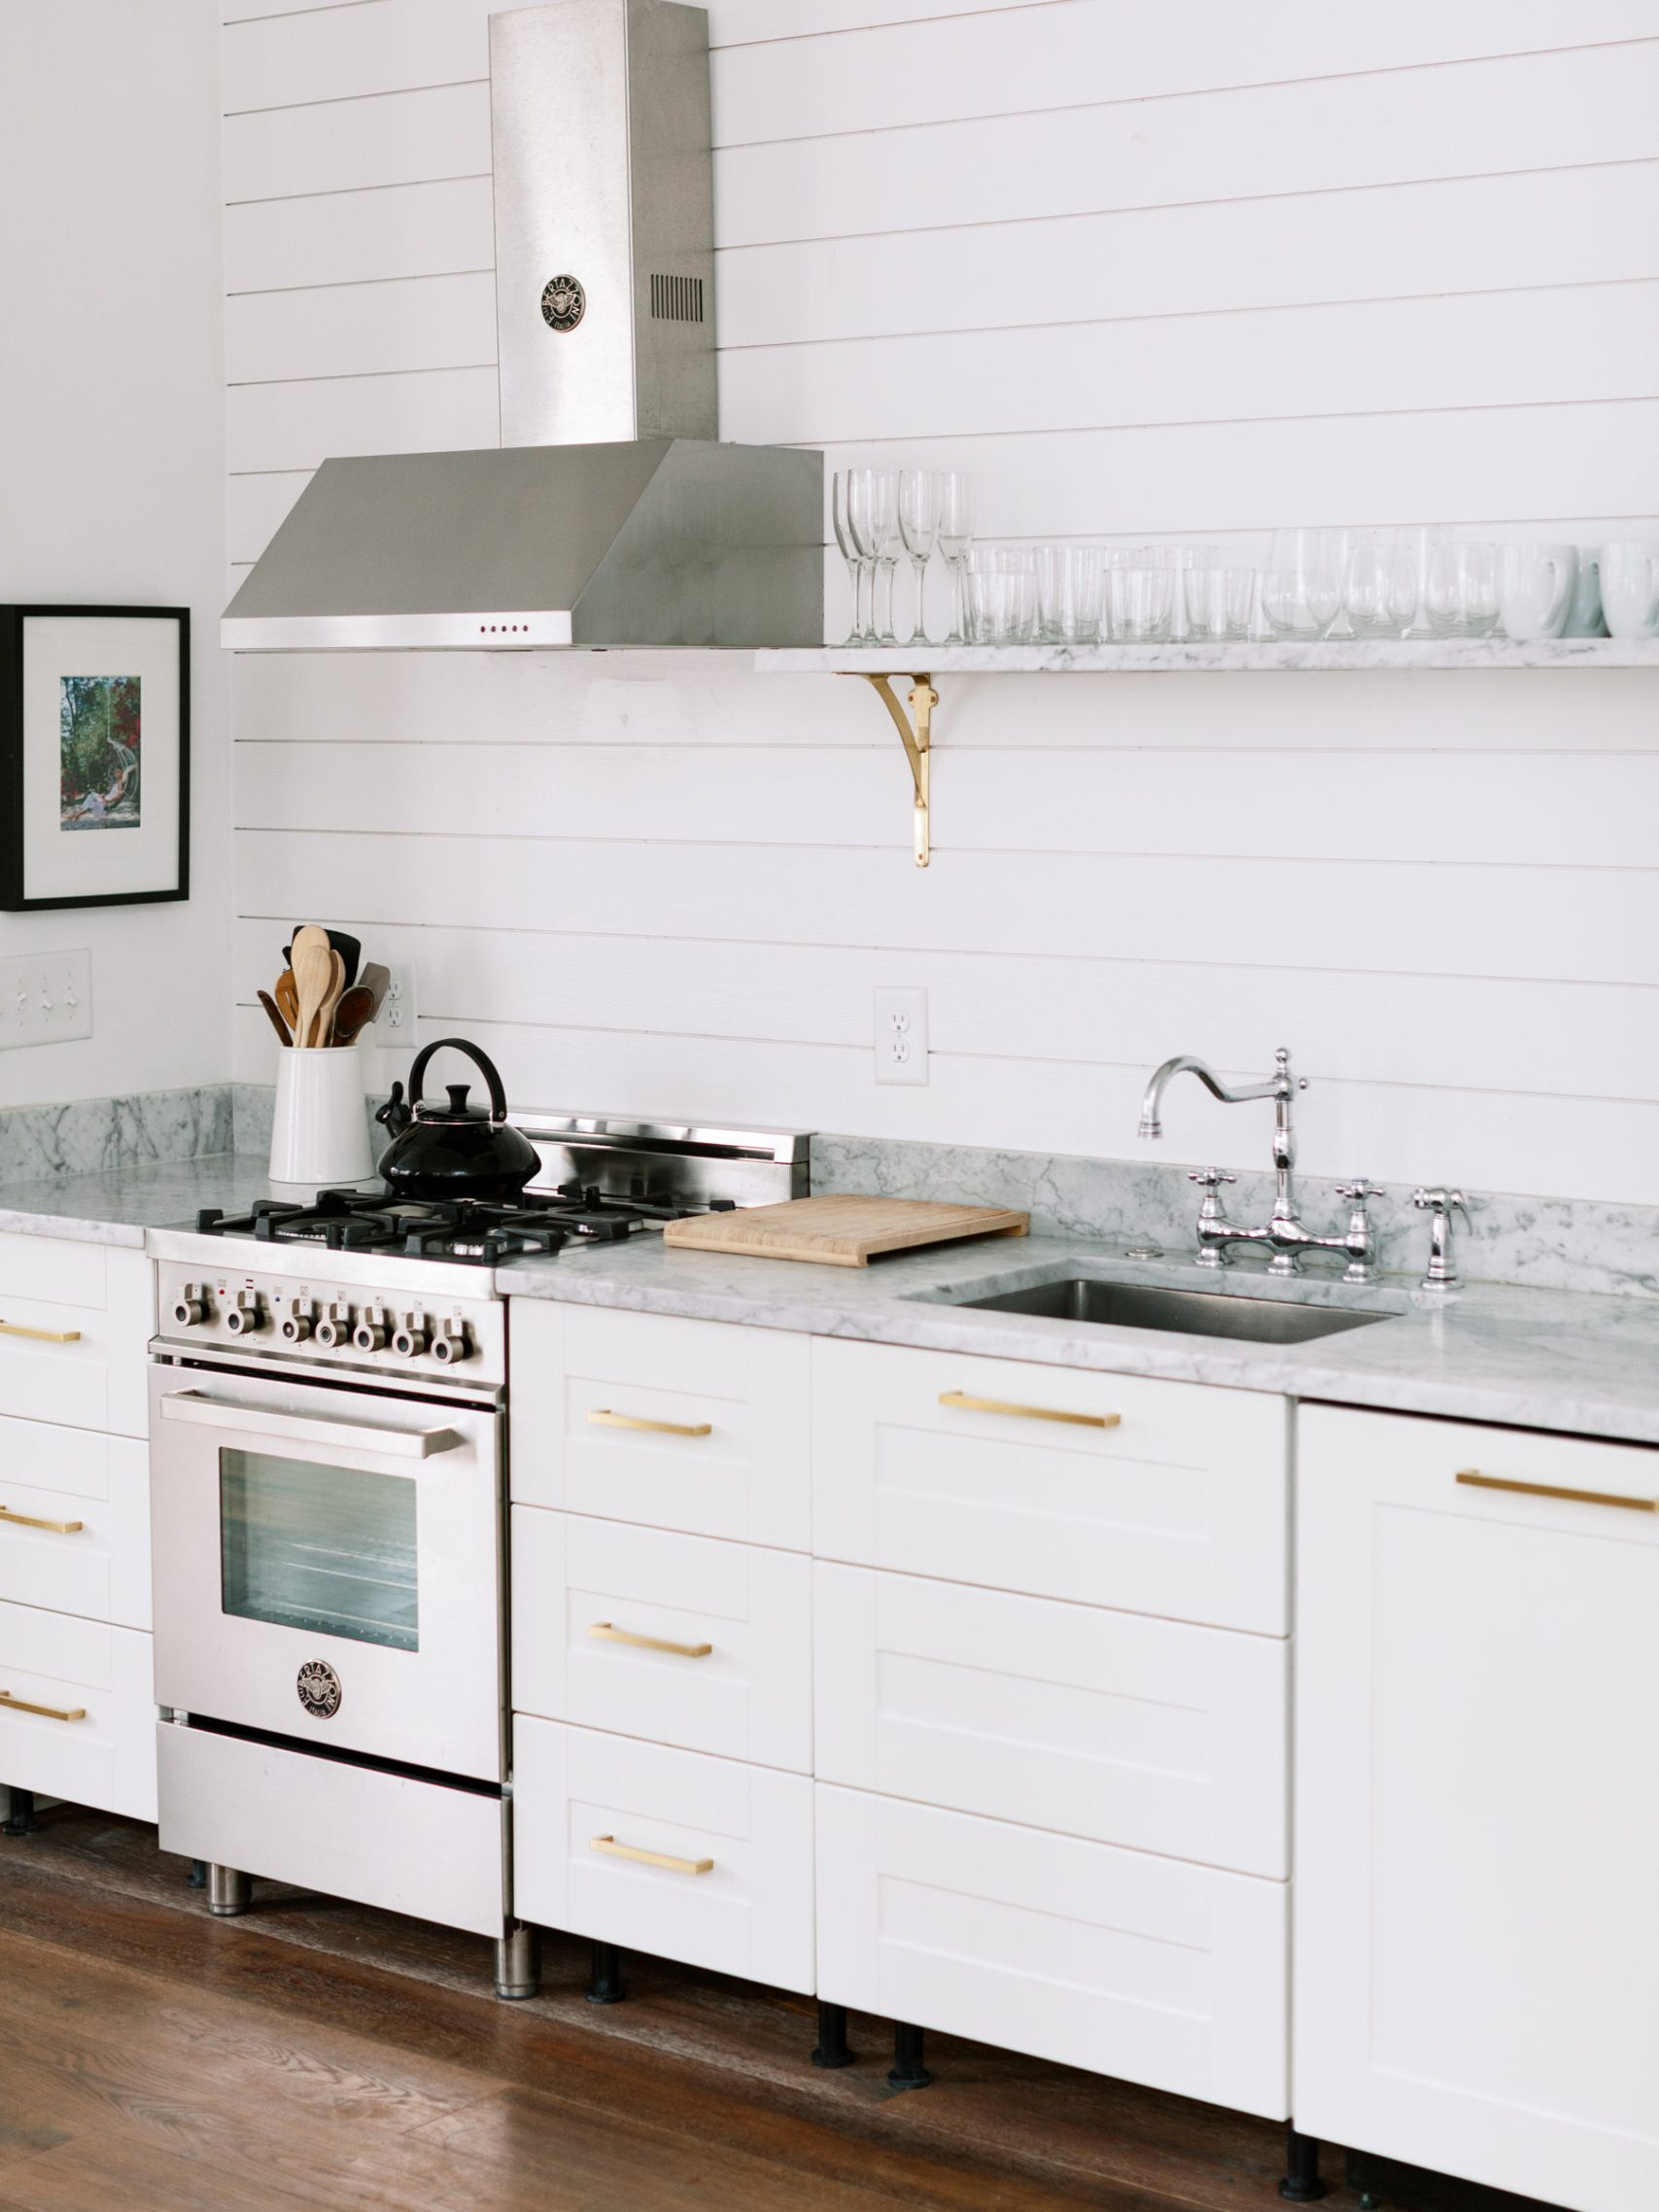 Mixed metals in clean white kitchen